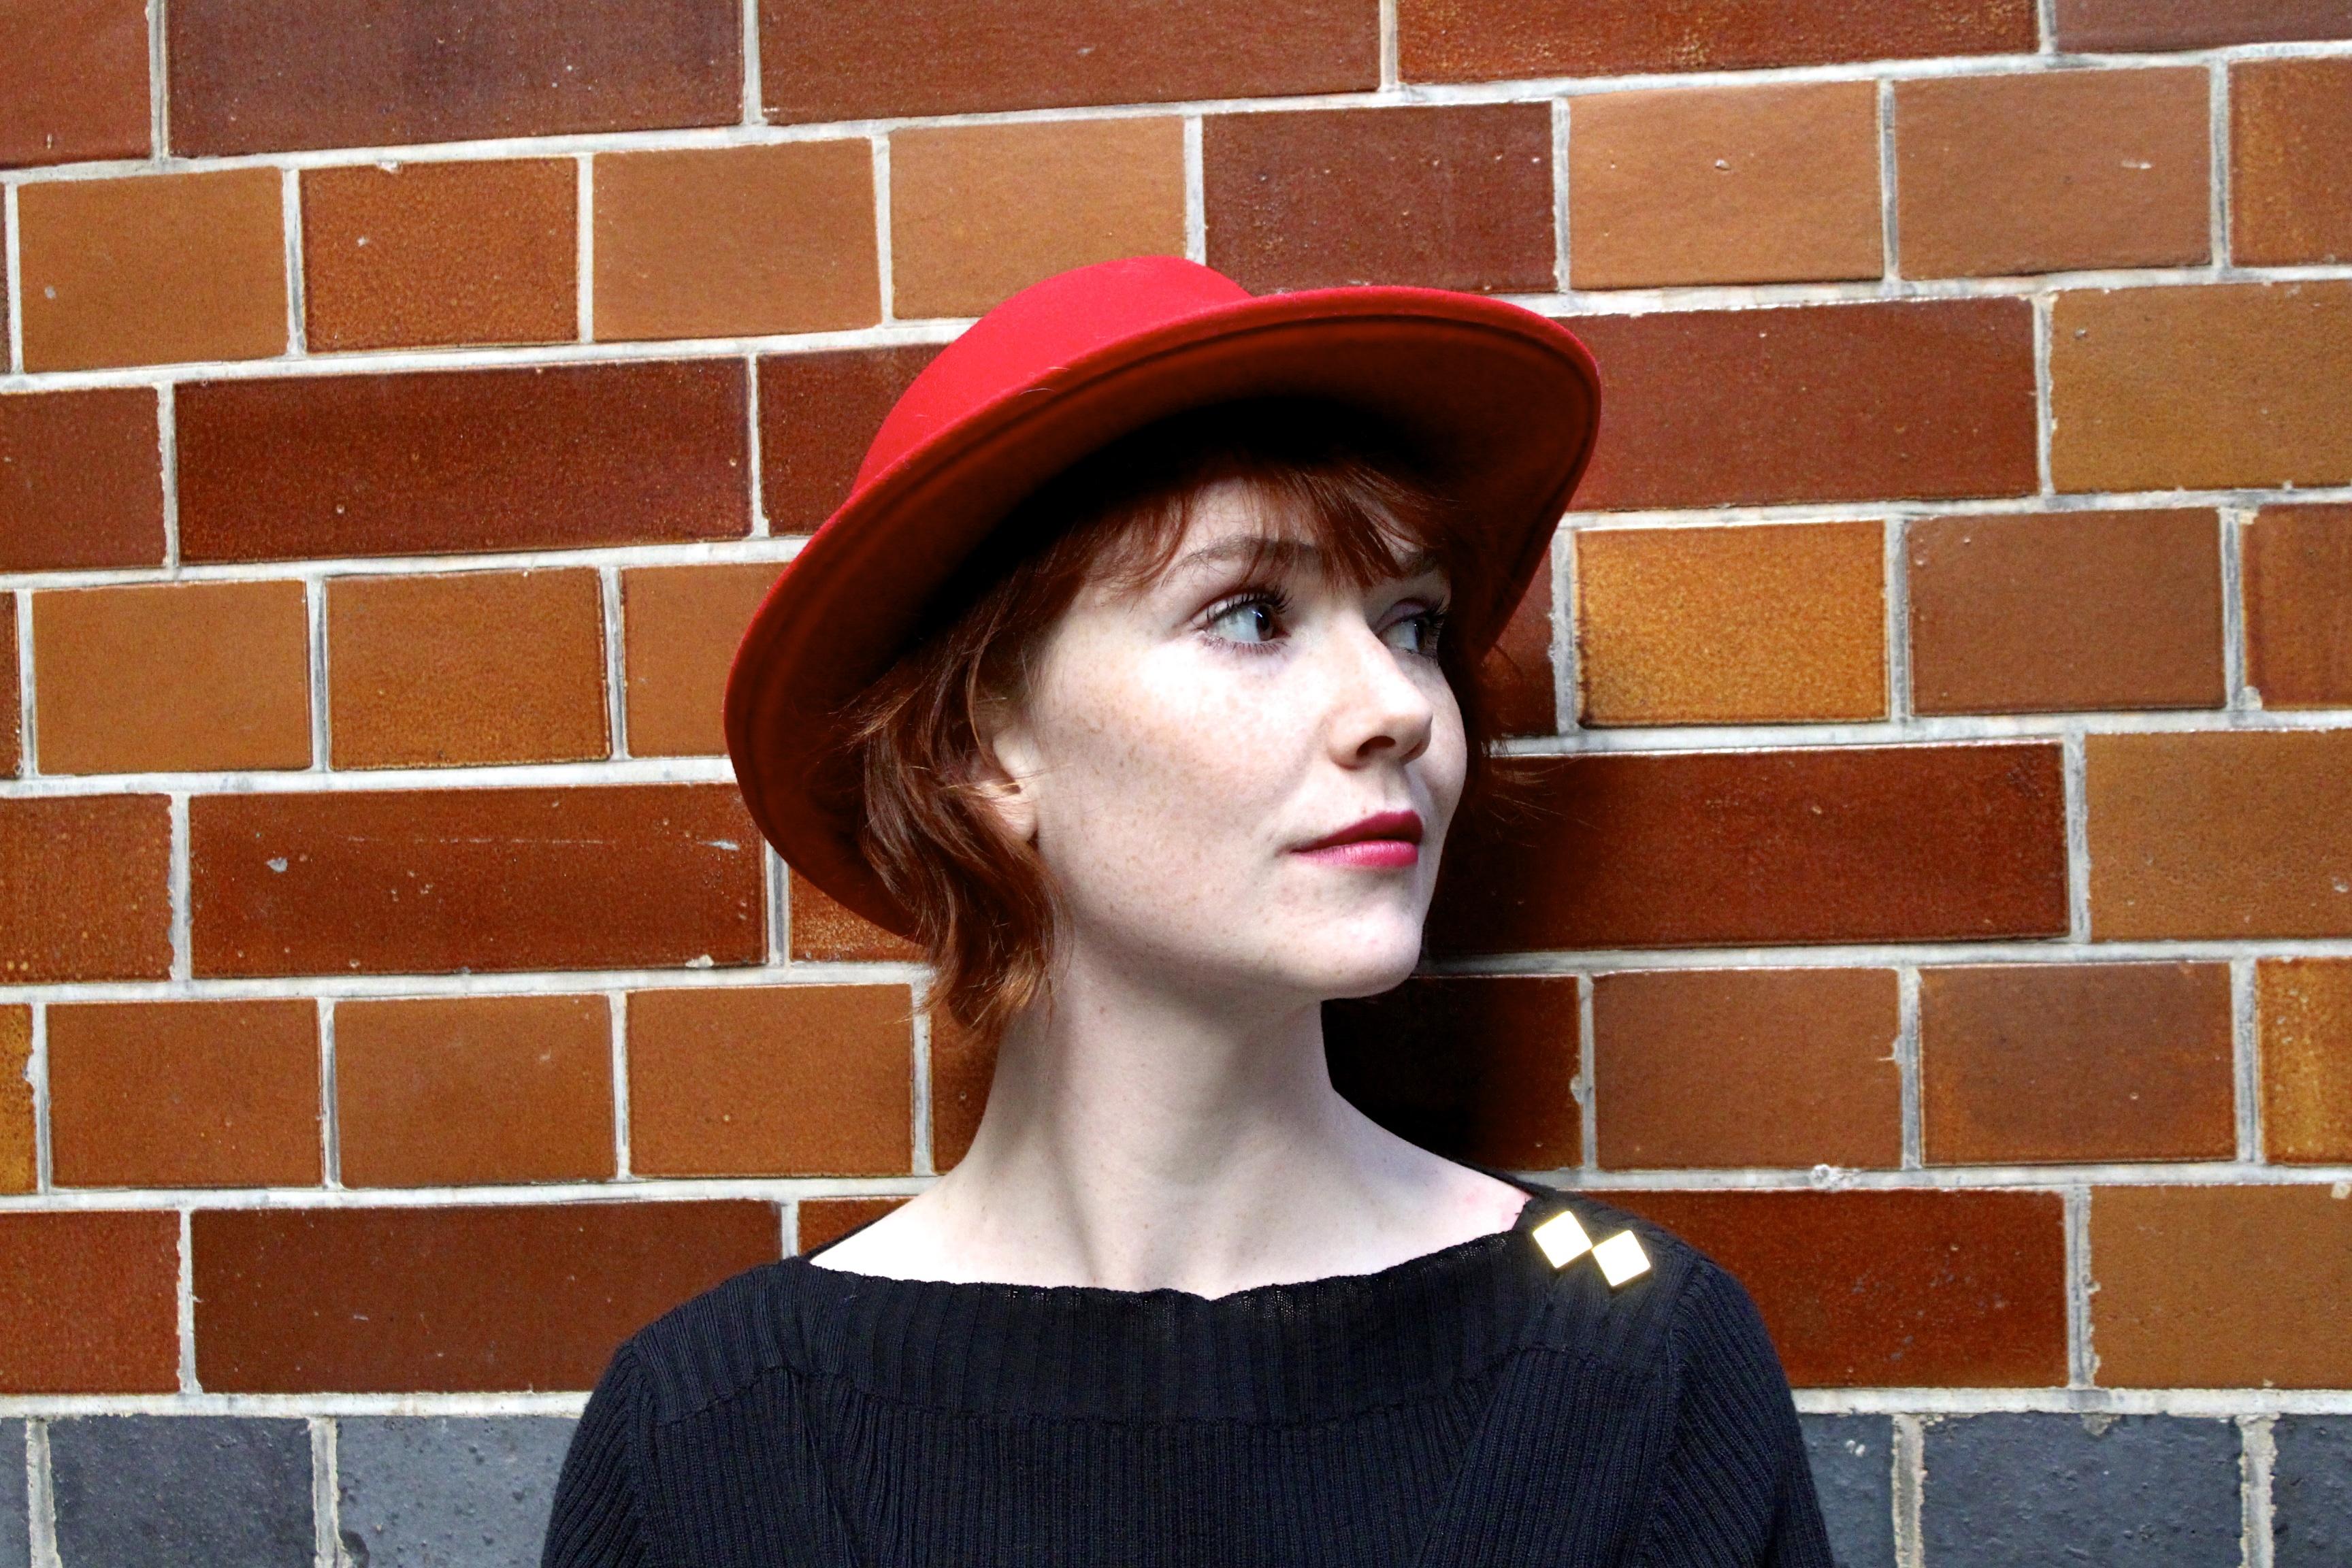 Profile: Elf Lyons